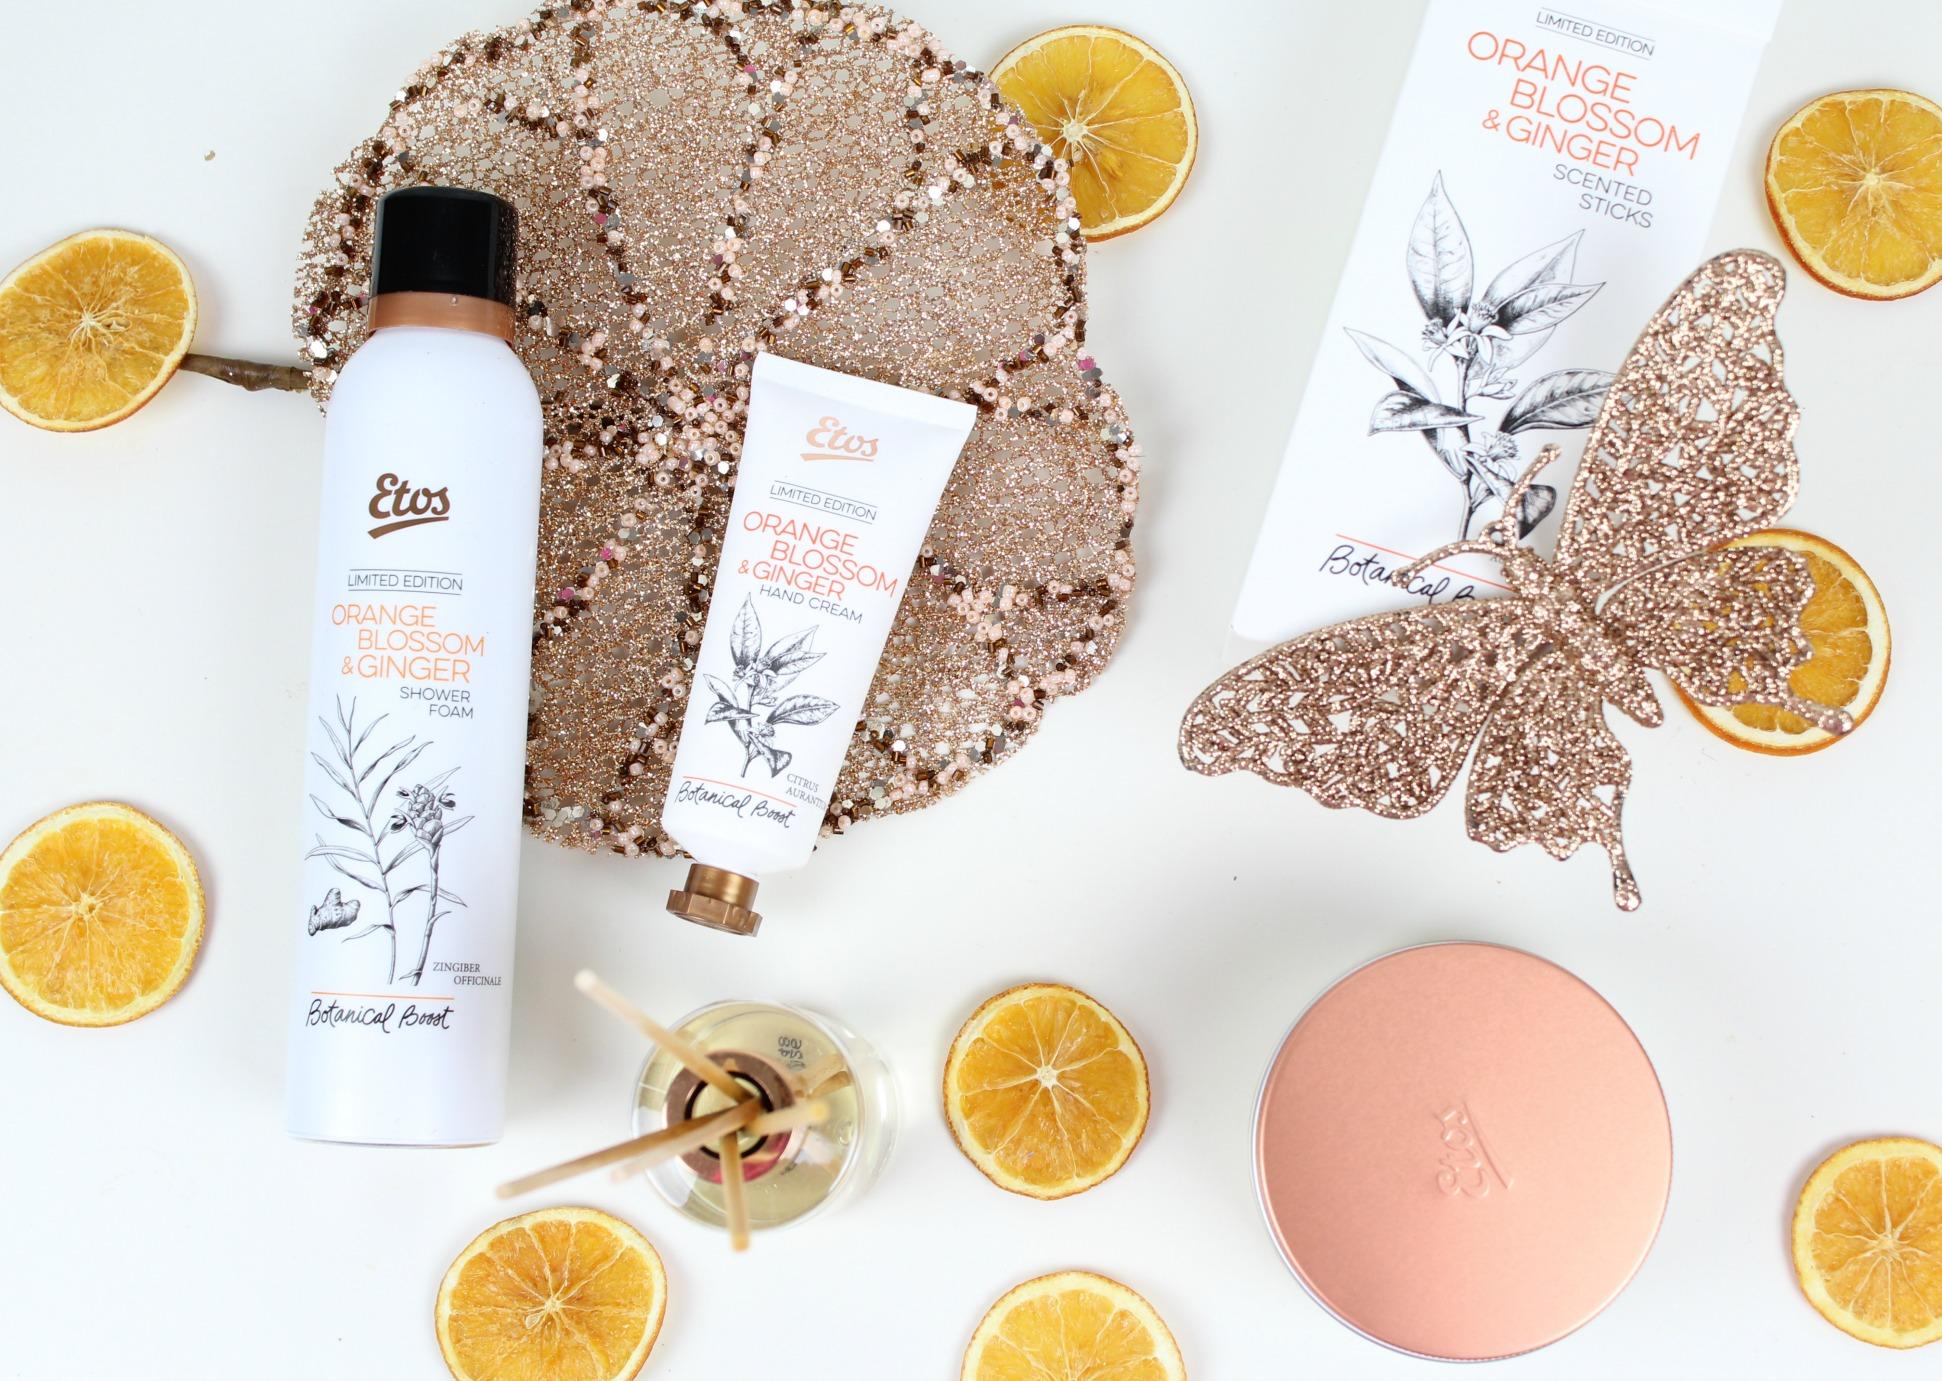 Review-Etos-Botanical-Boost-Orange-Blossom-Ginger-GoodGirlsCompany